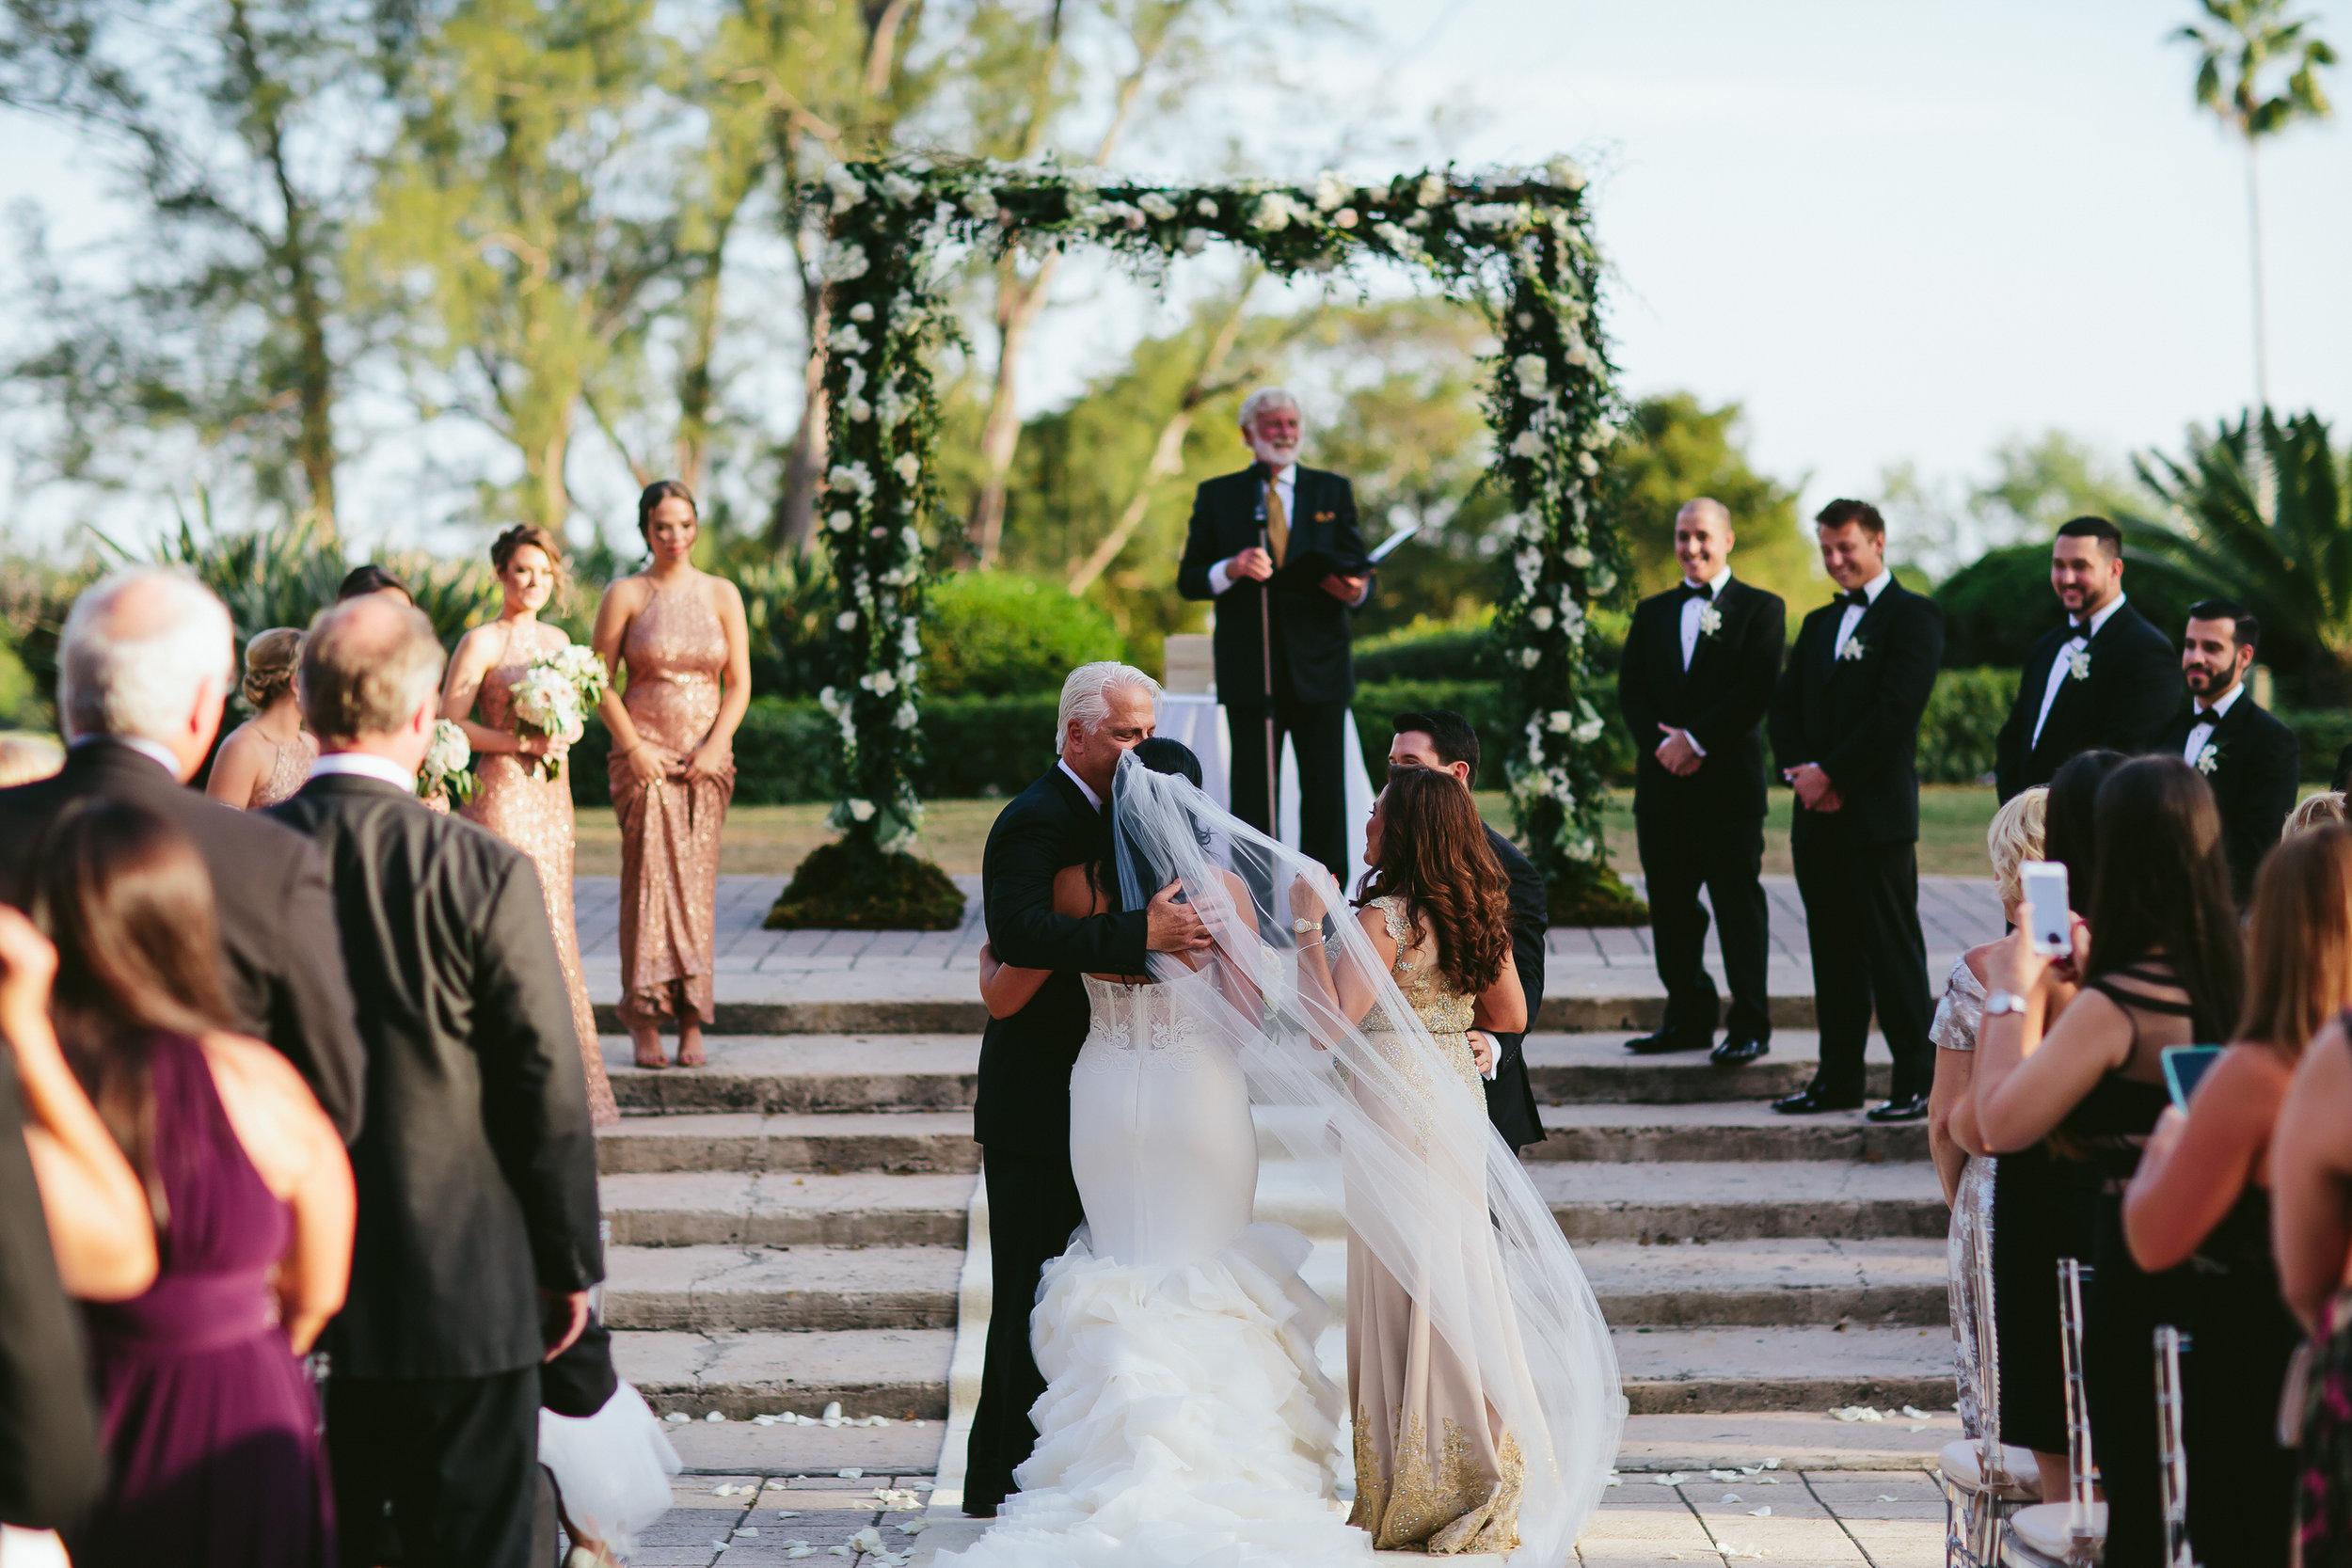 miami-biltmore-wedding-photographer-ceremony-steph-lynn-photo-14.jpg